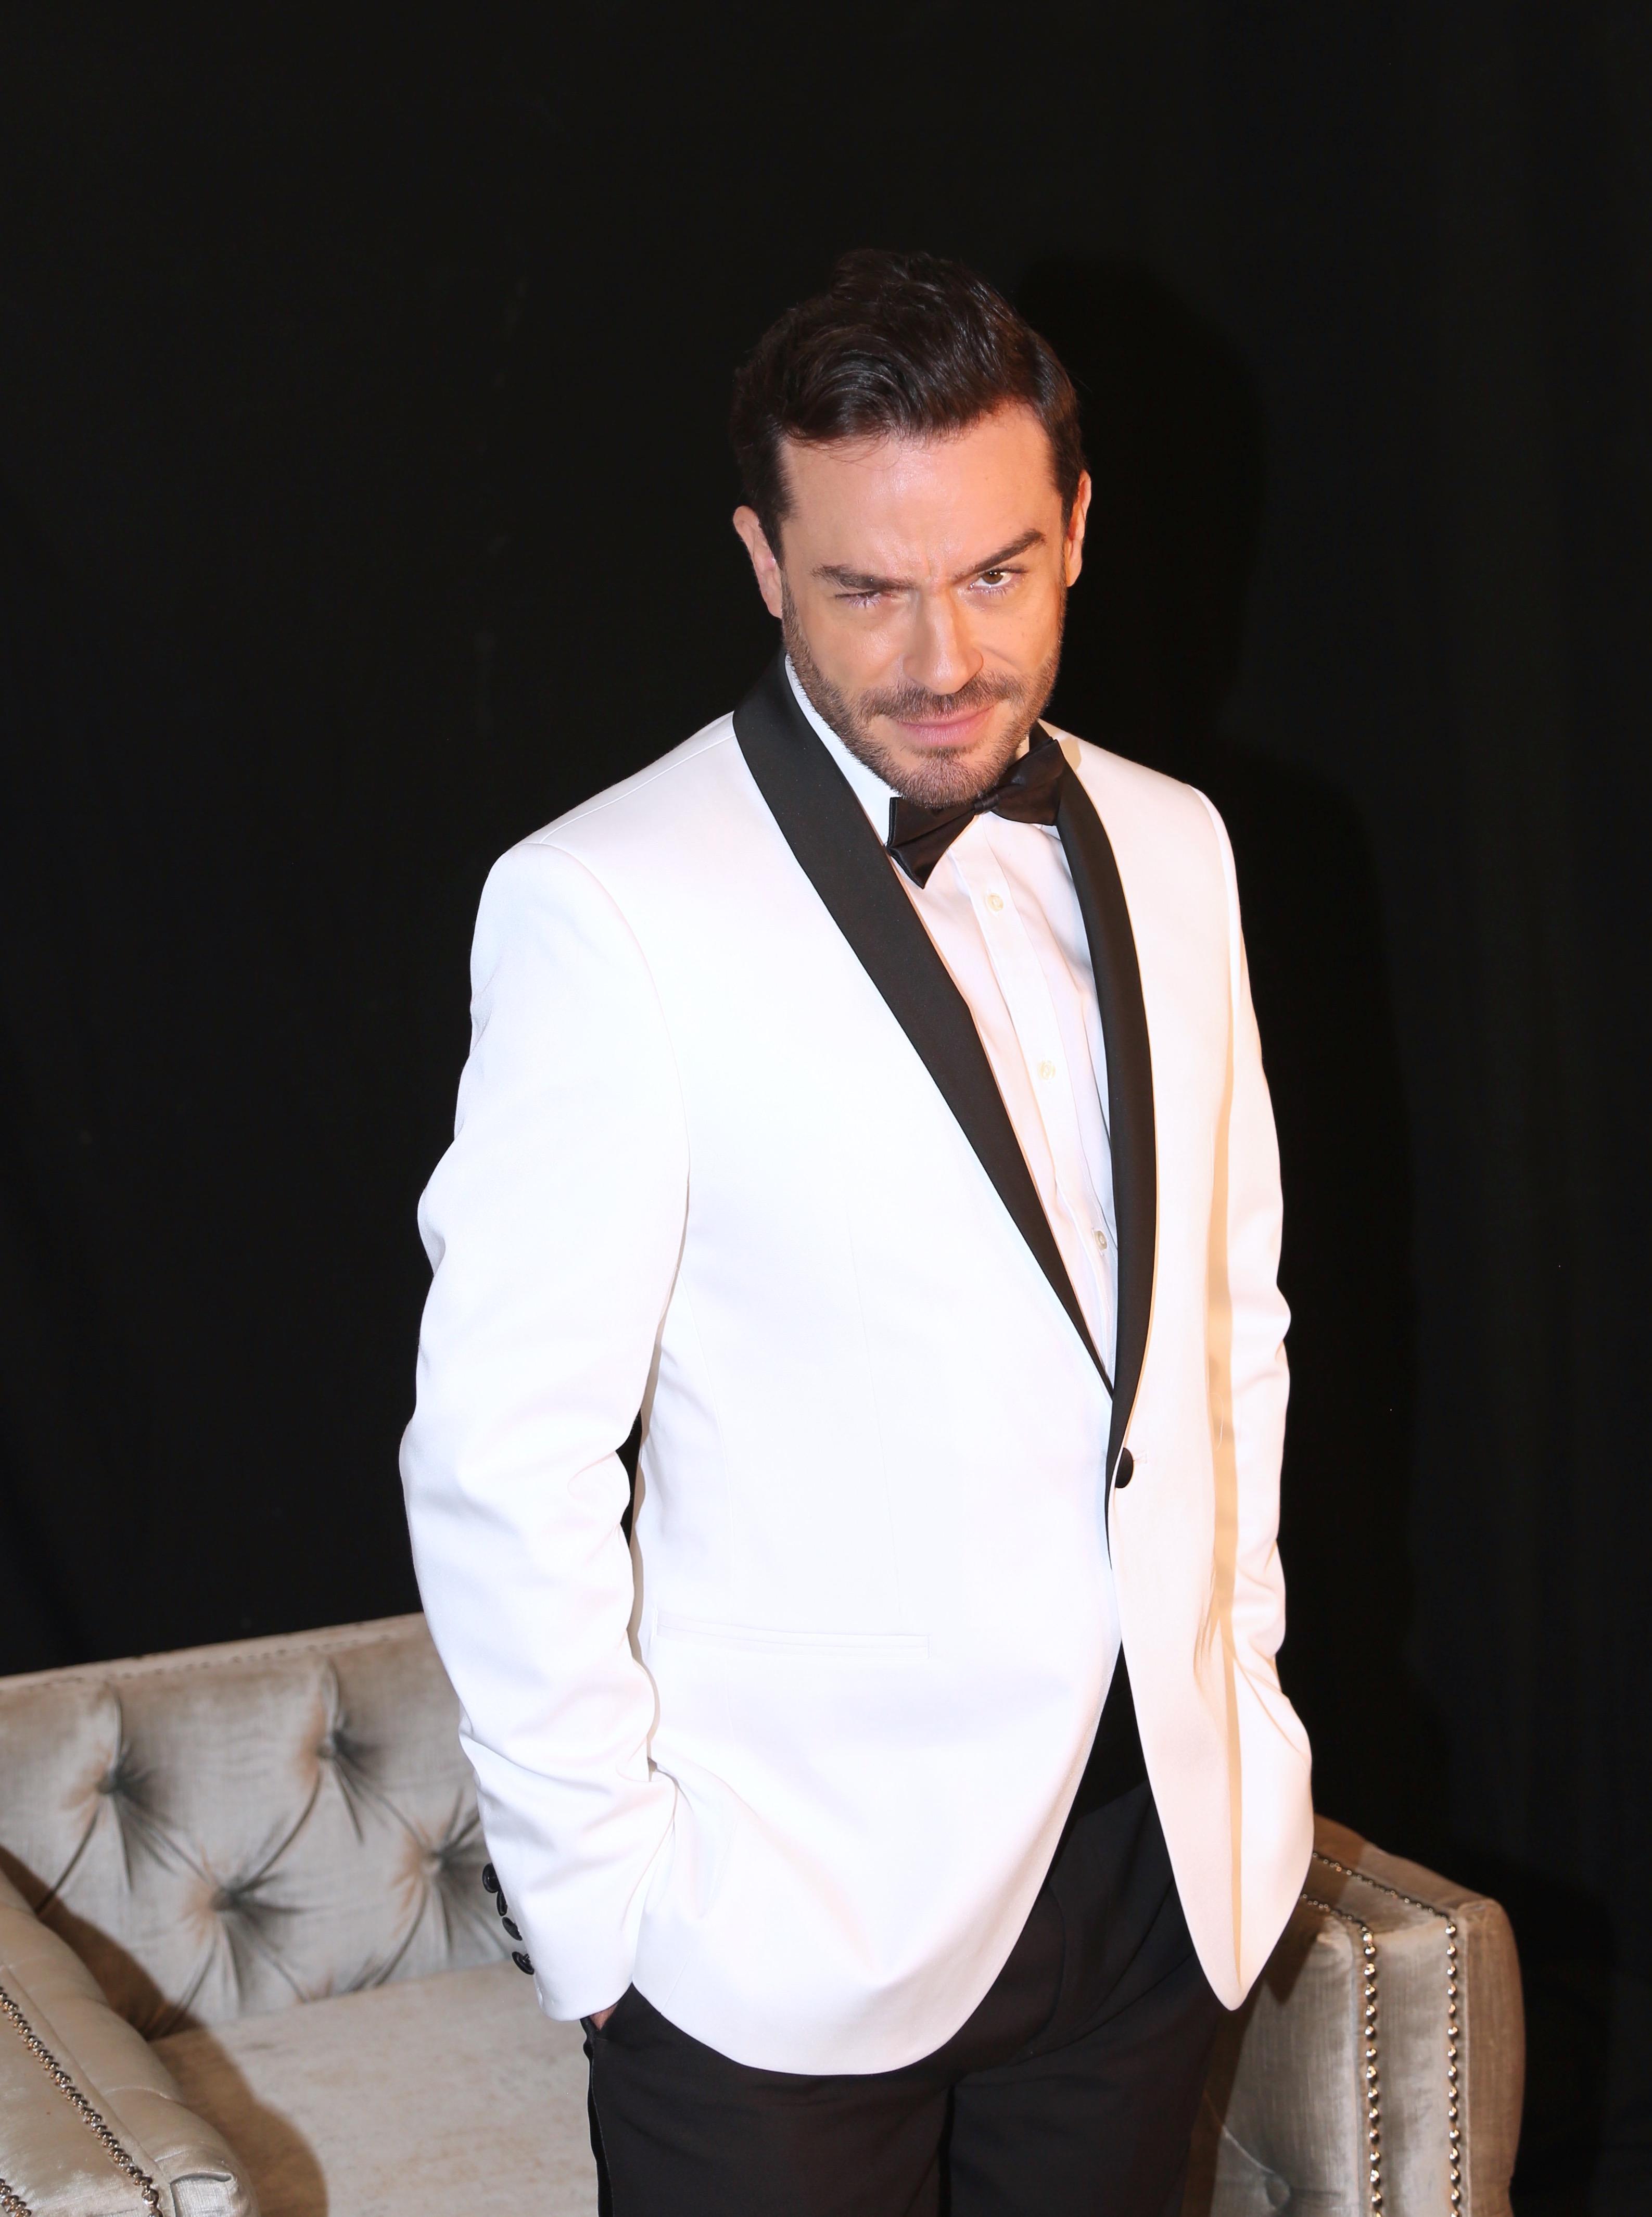 Juan Pablo Espinoza